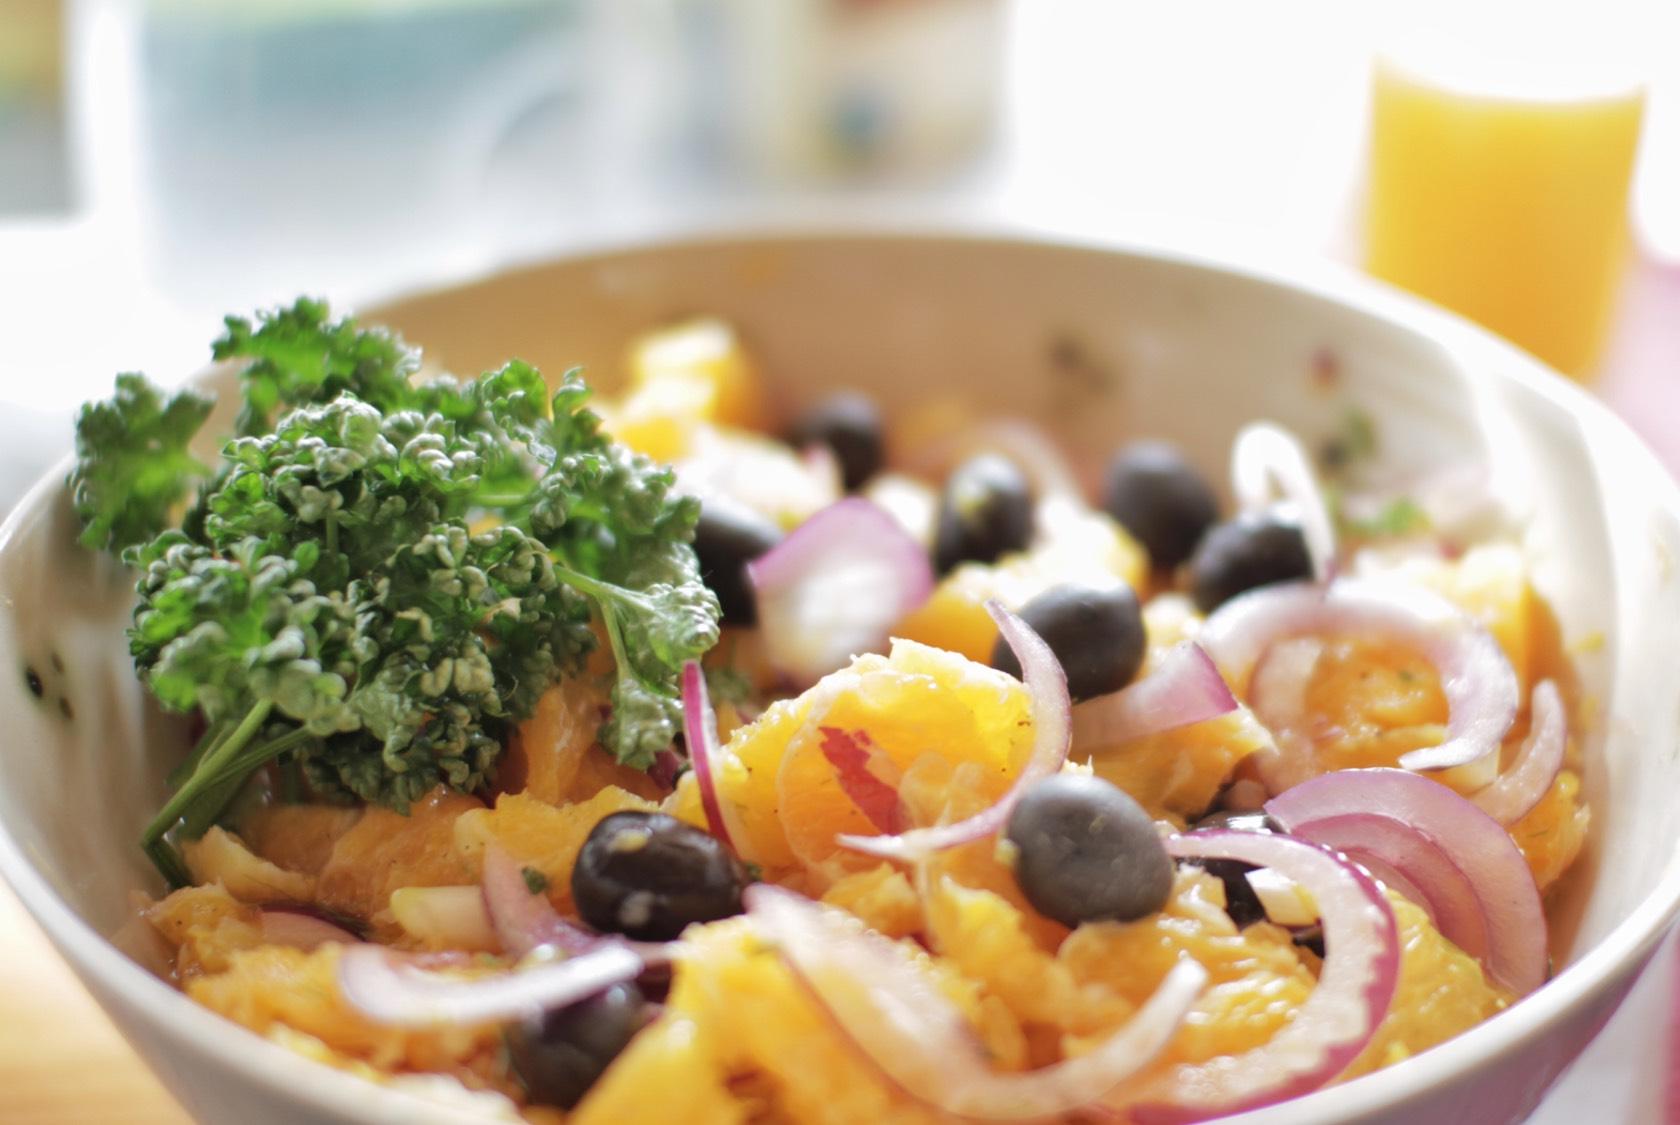 Paleo Orangen Zwiebel Salat